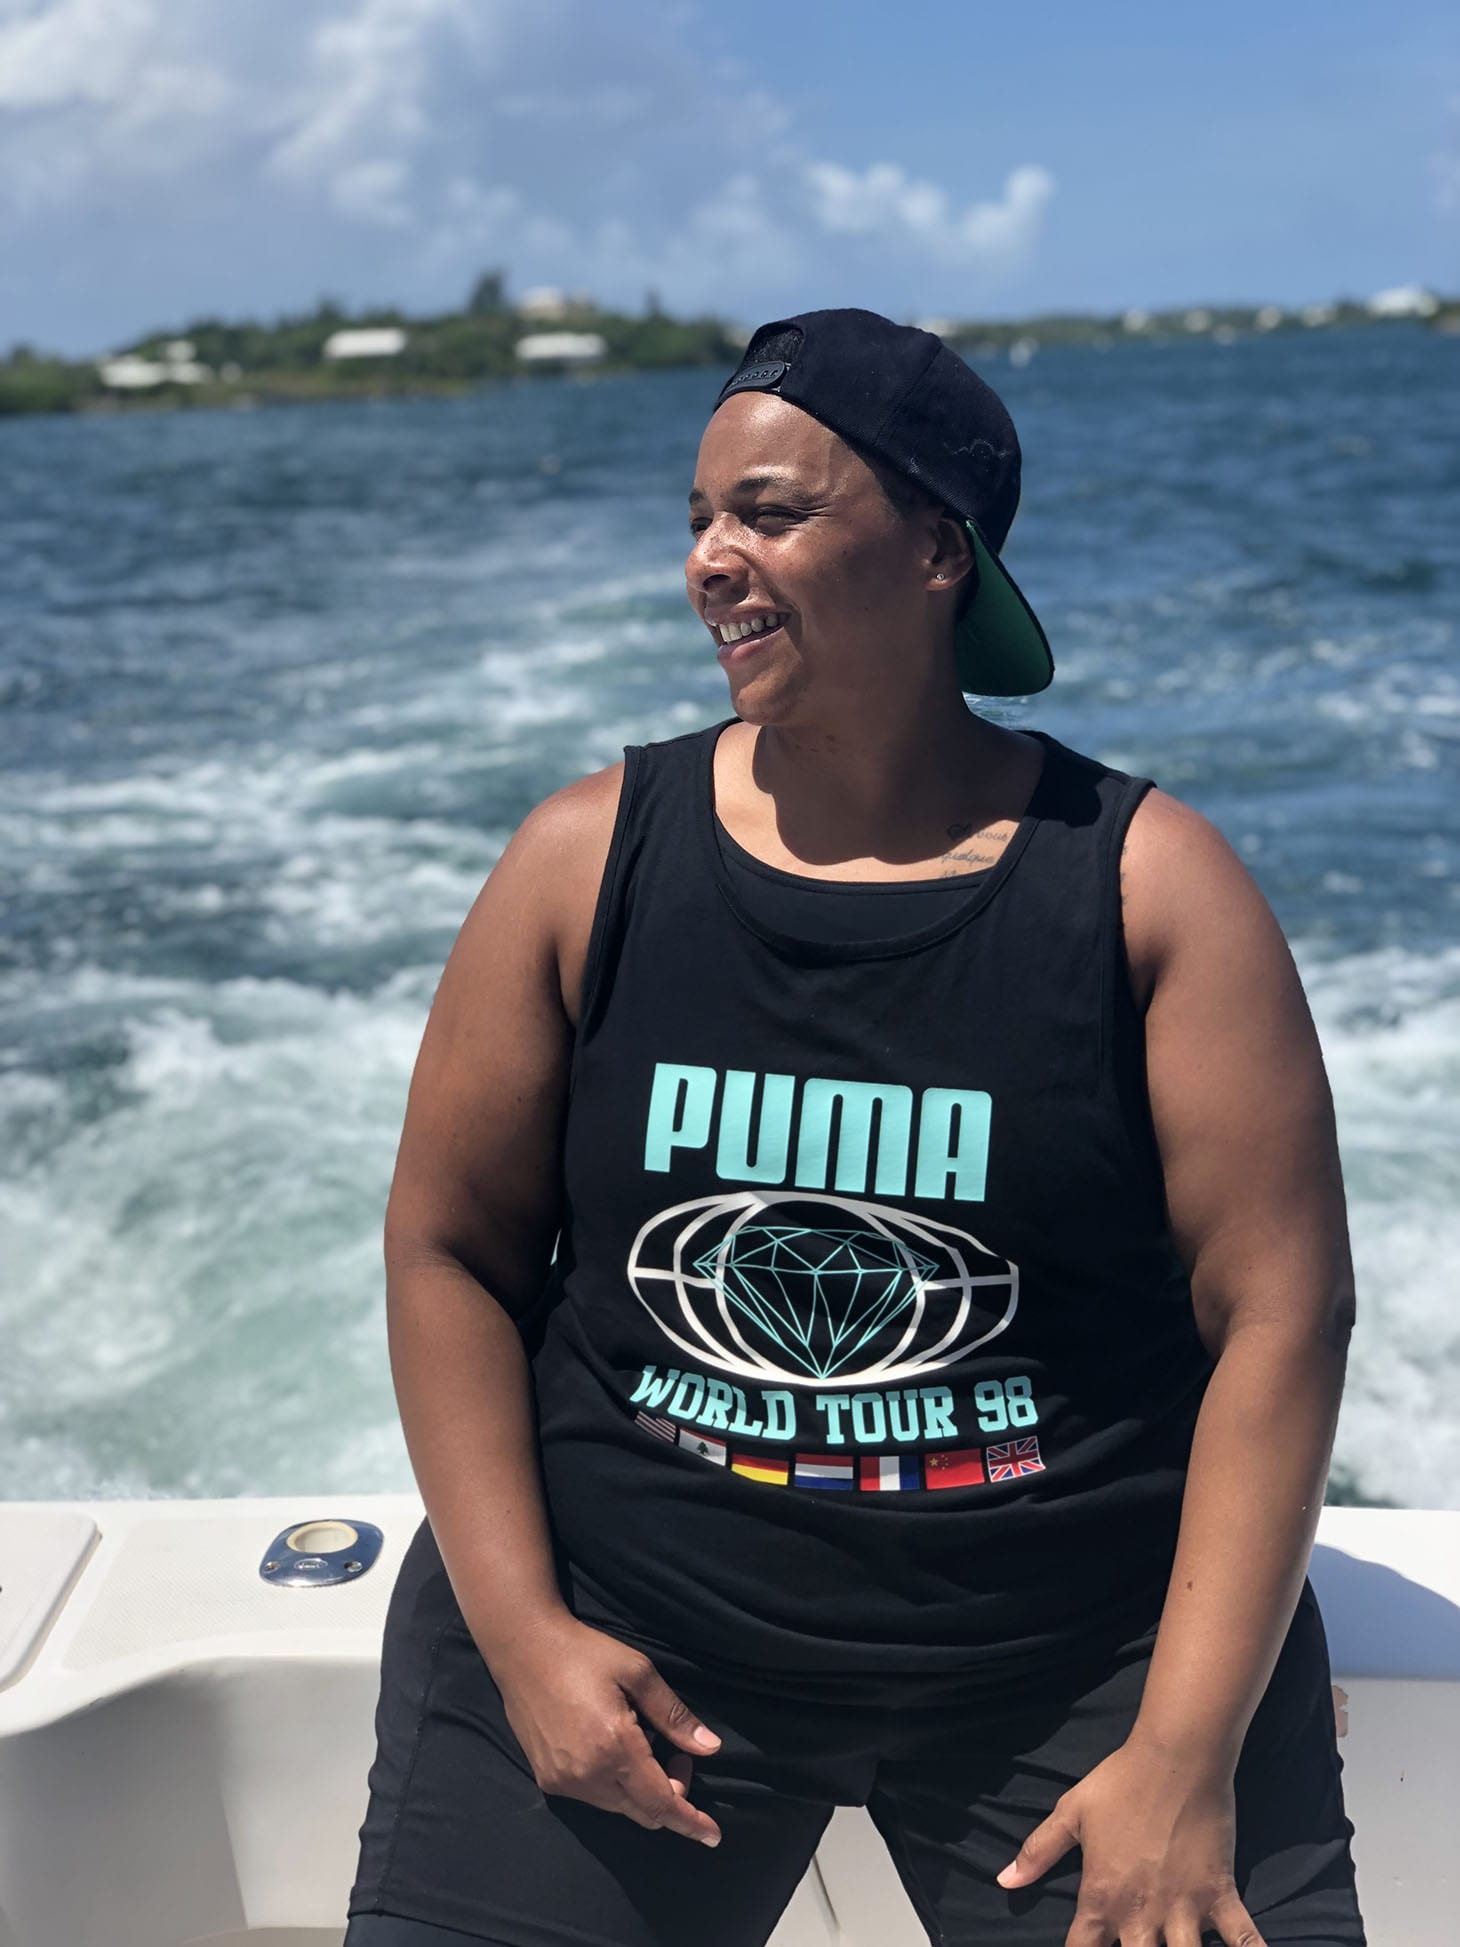 Health and Wellness coach, Coach Carey on a boat on a sunny day.